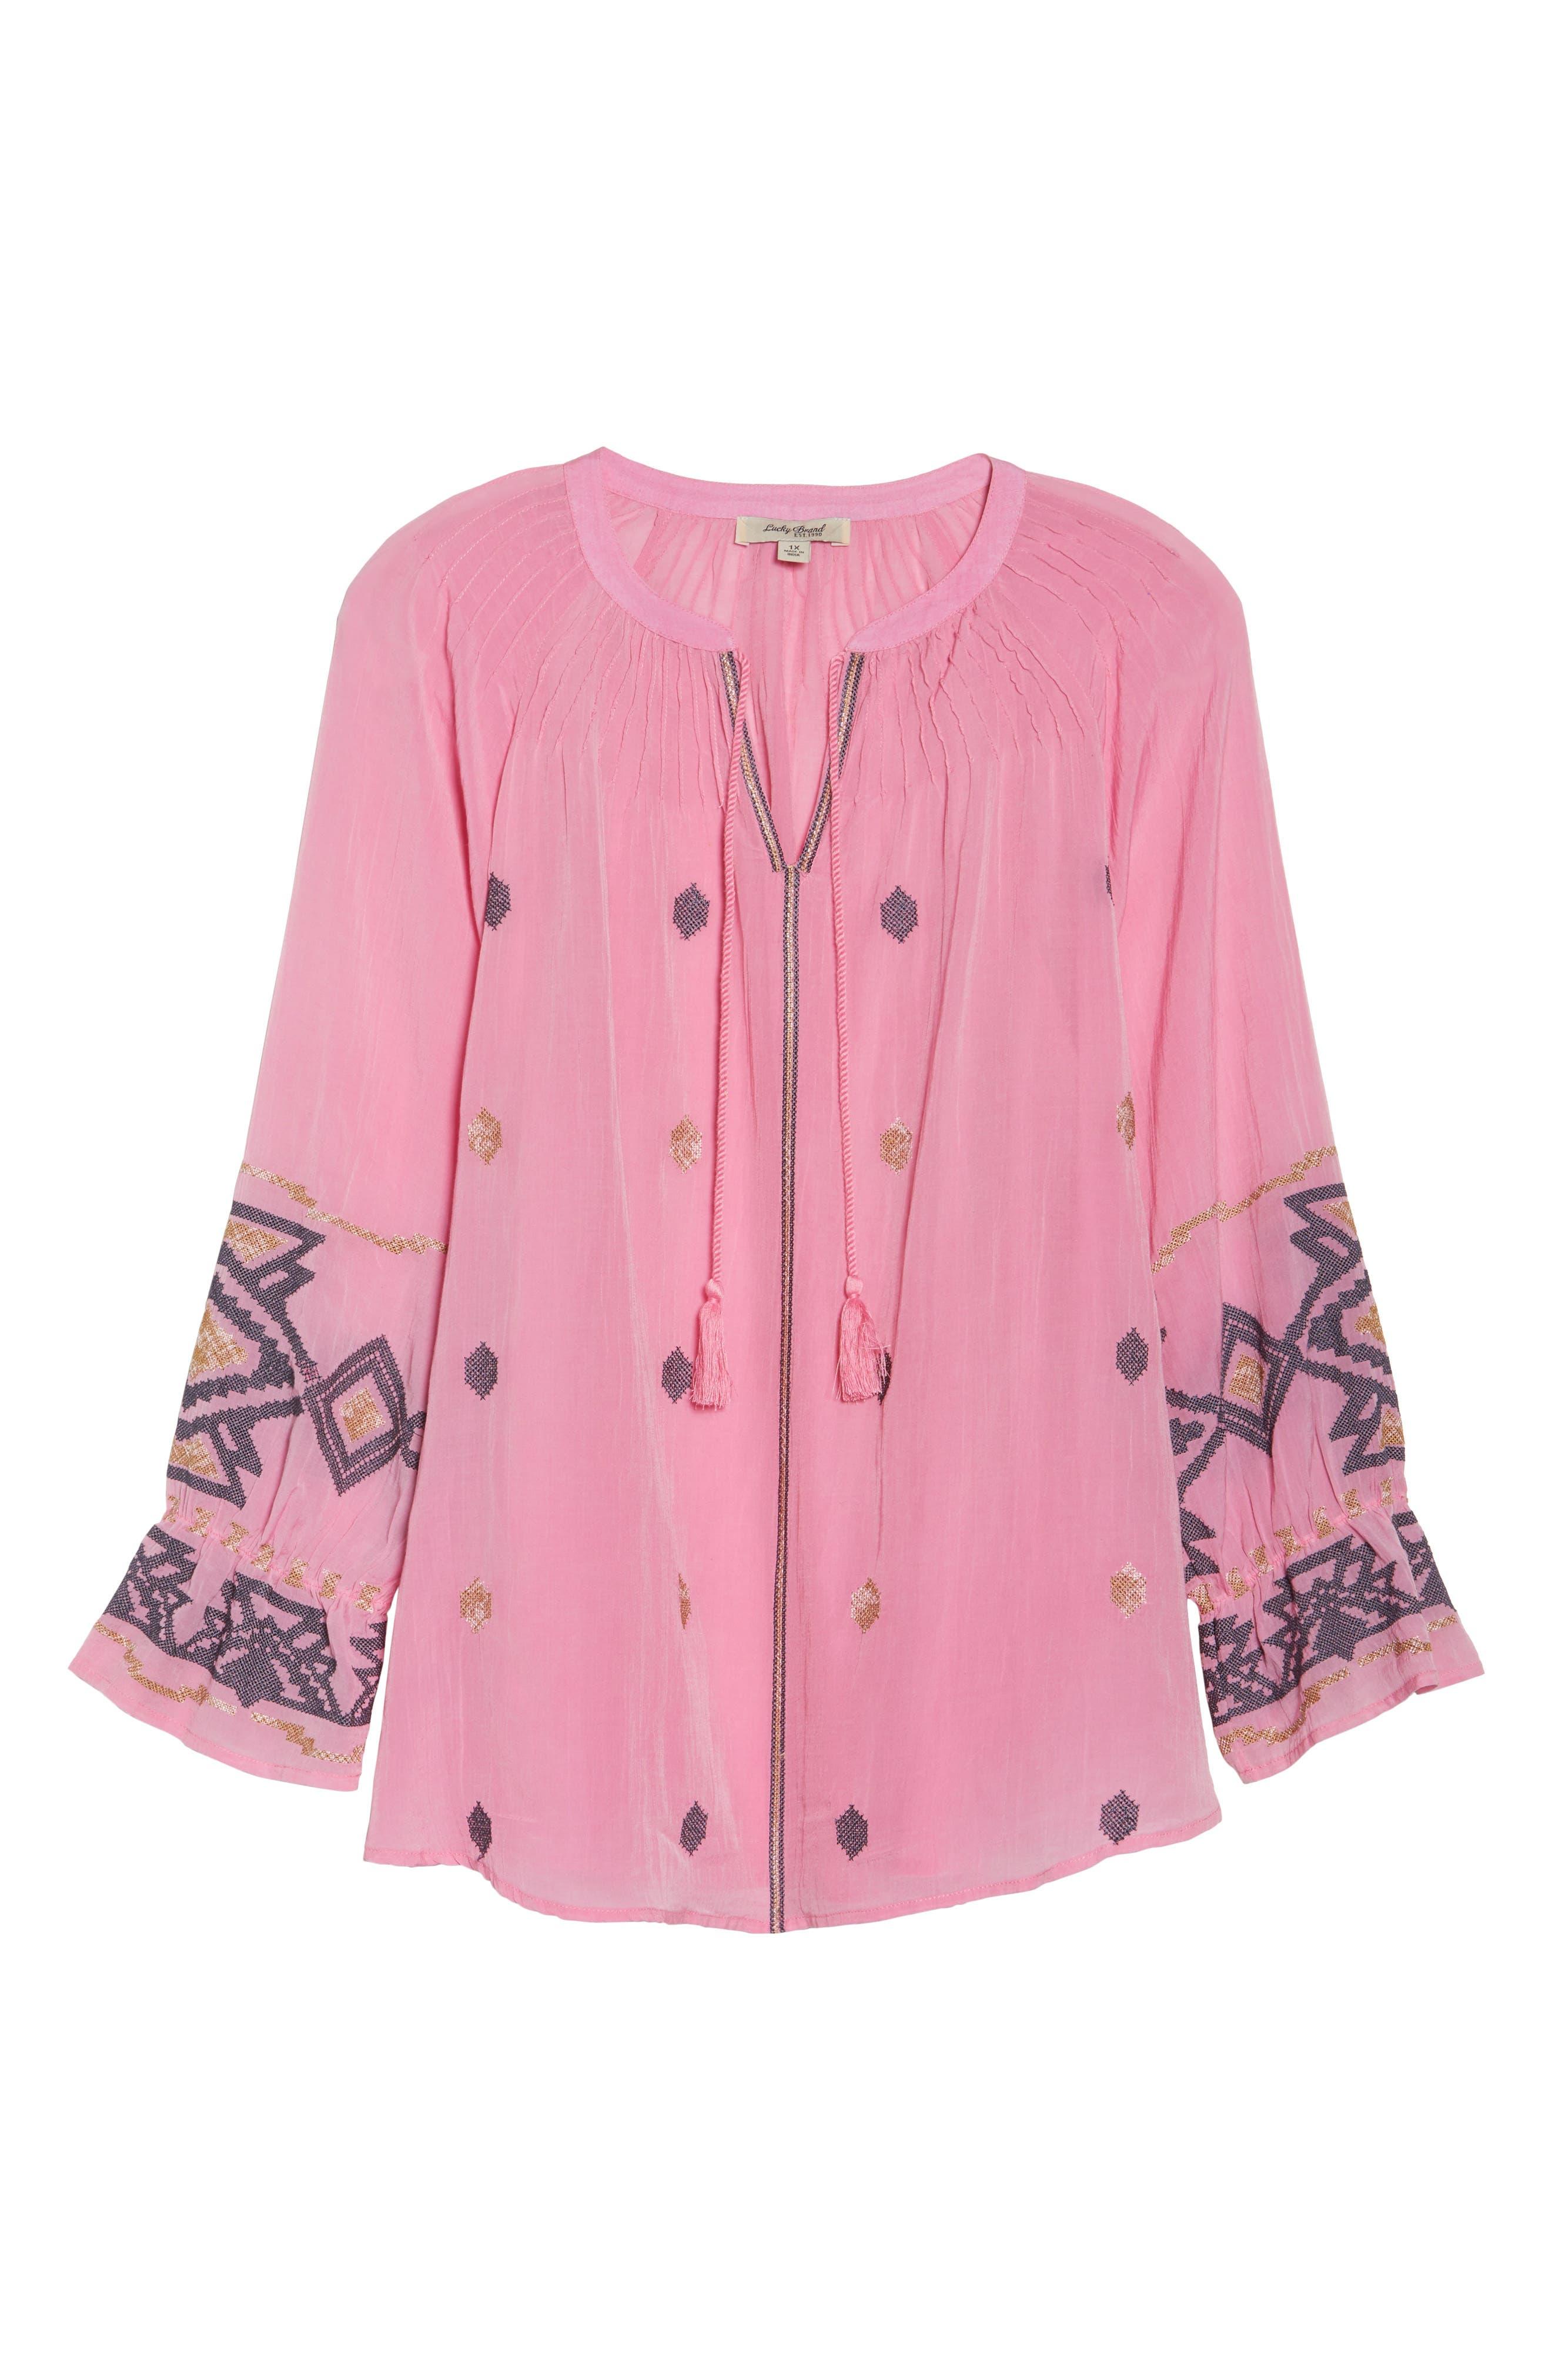 Metallic Embroidered Top,                             Alternate thumbnail 6, color,                             Flamingo Pink